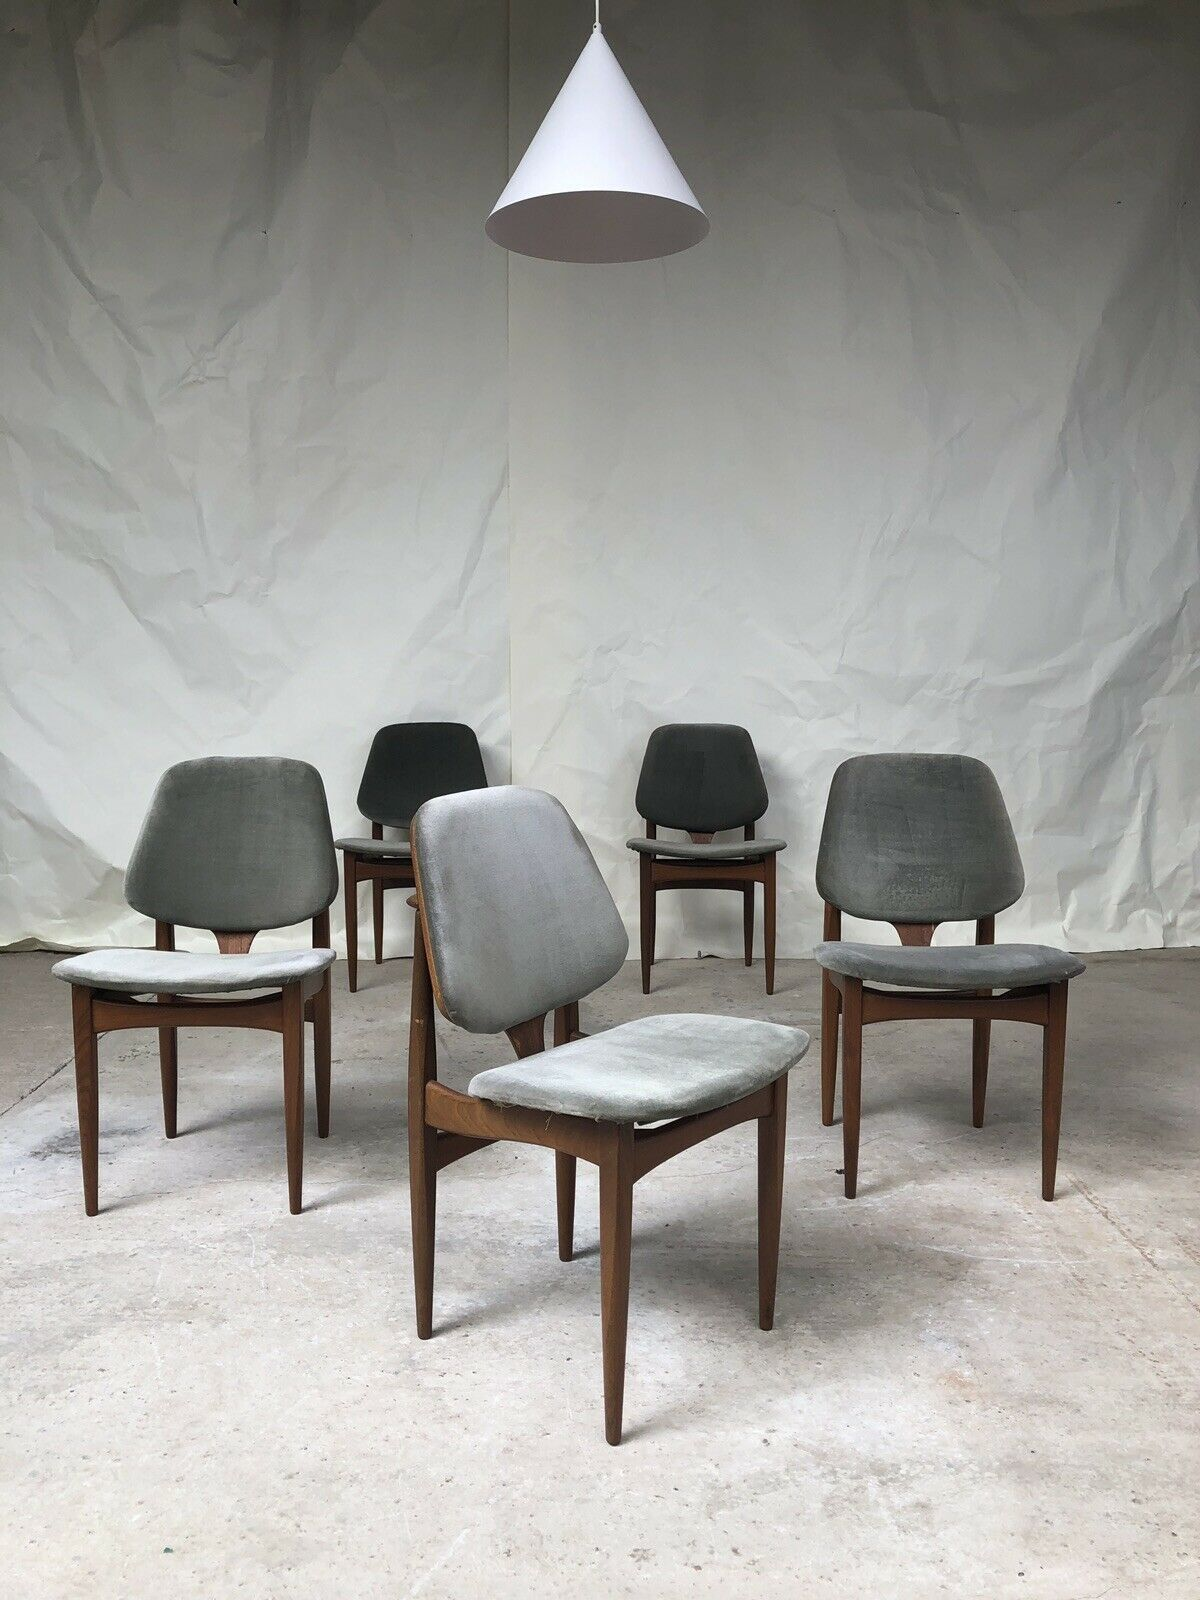 Fantastic Vtg Mid Century Set Of 5 Elliots Of Newbury Eon Dining Chairs Danish Design Mcm Pabps2019 Chair Design Images Pabps2019Com